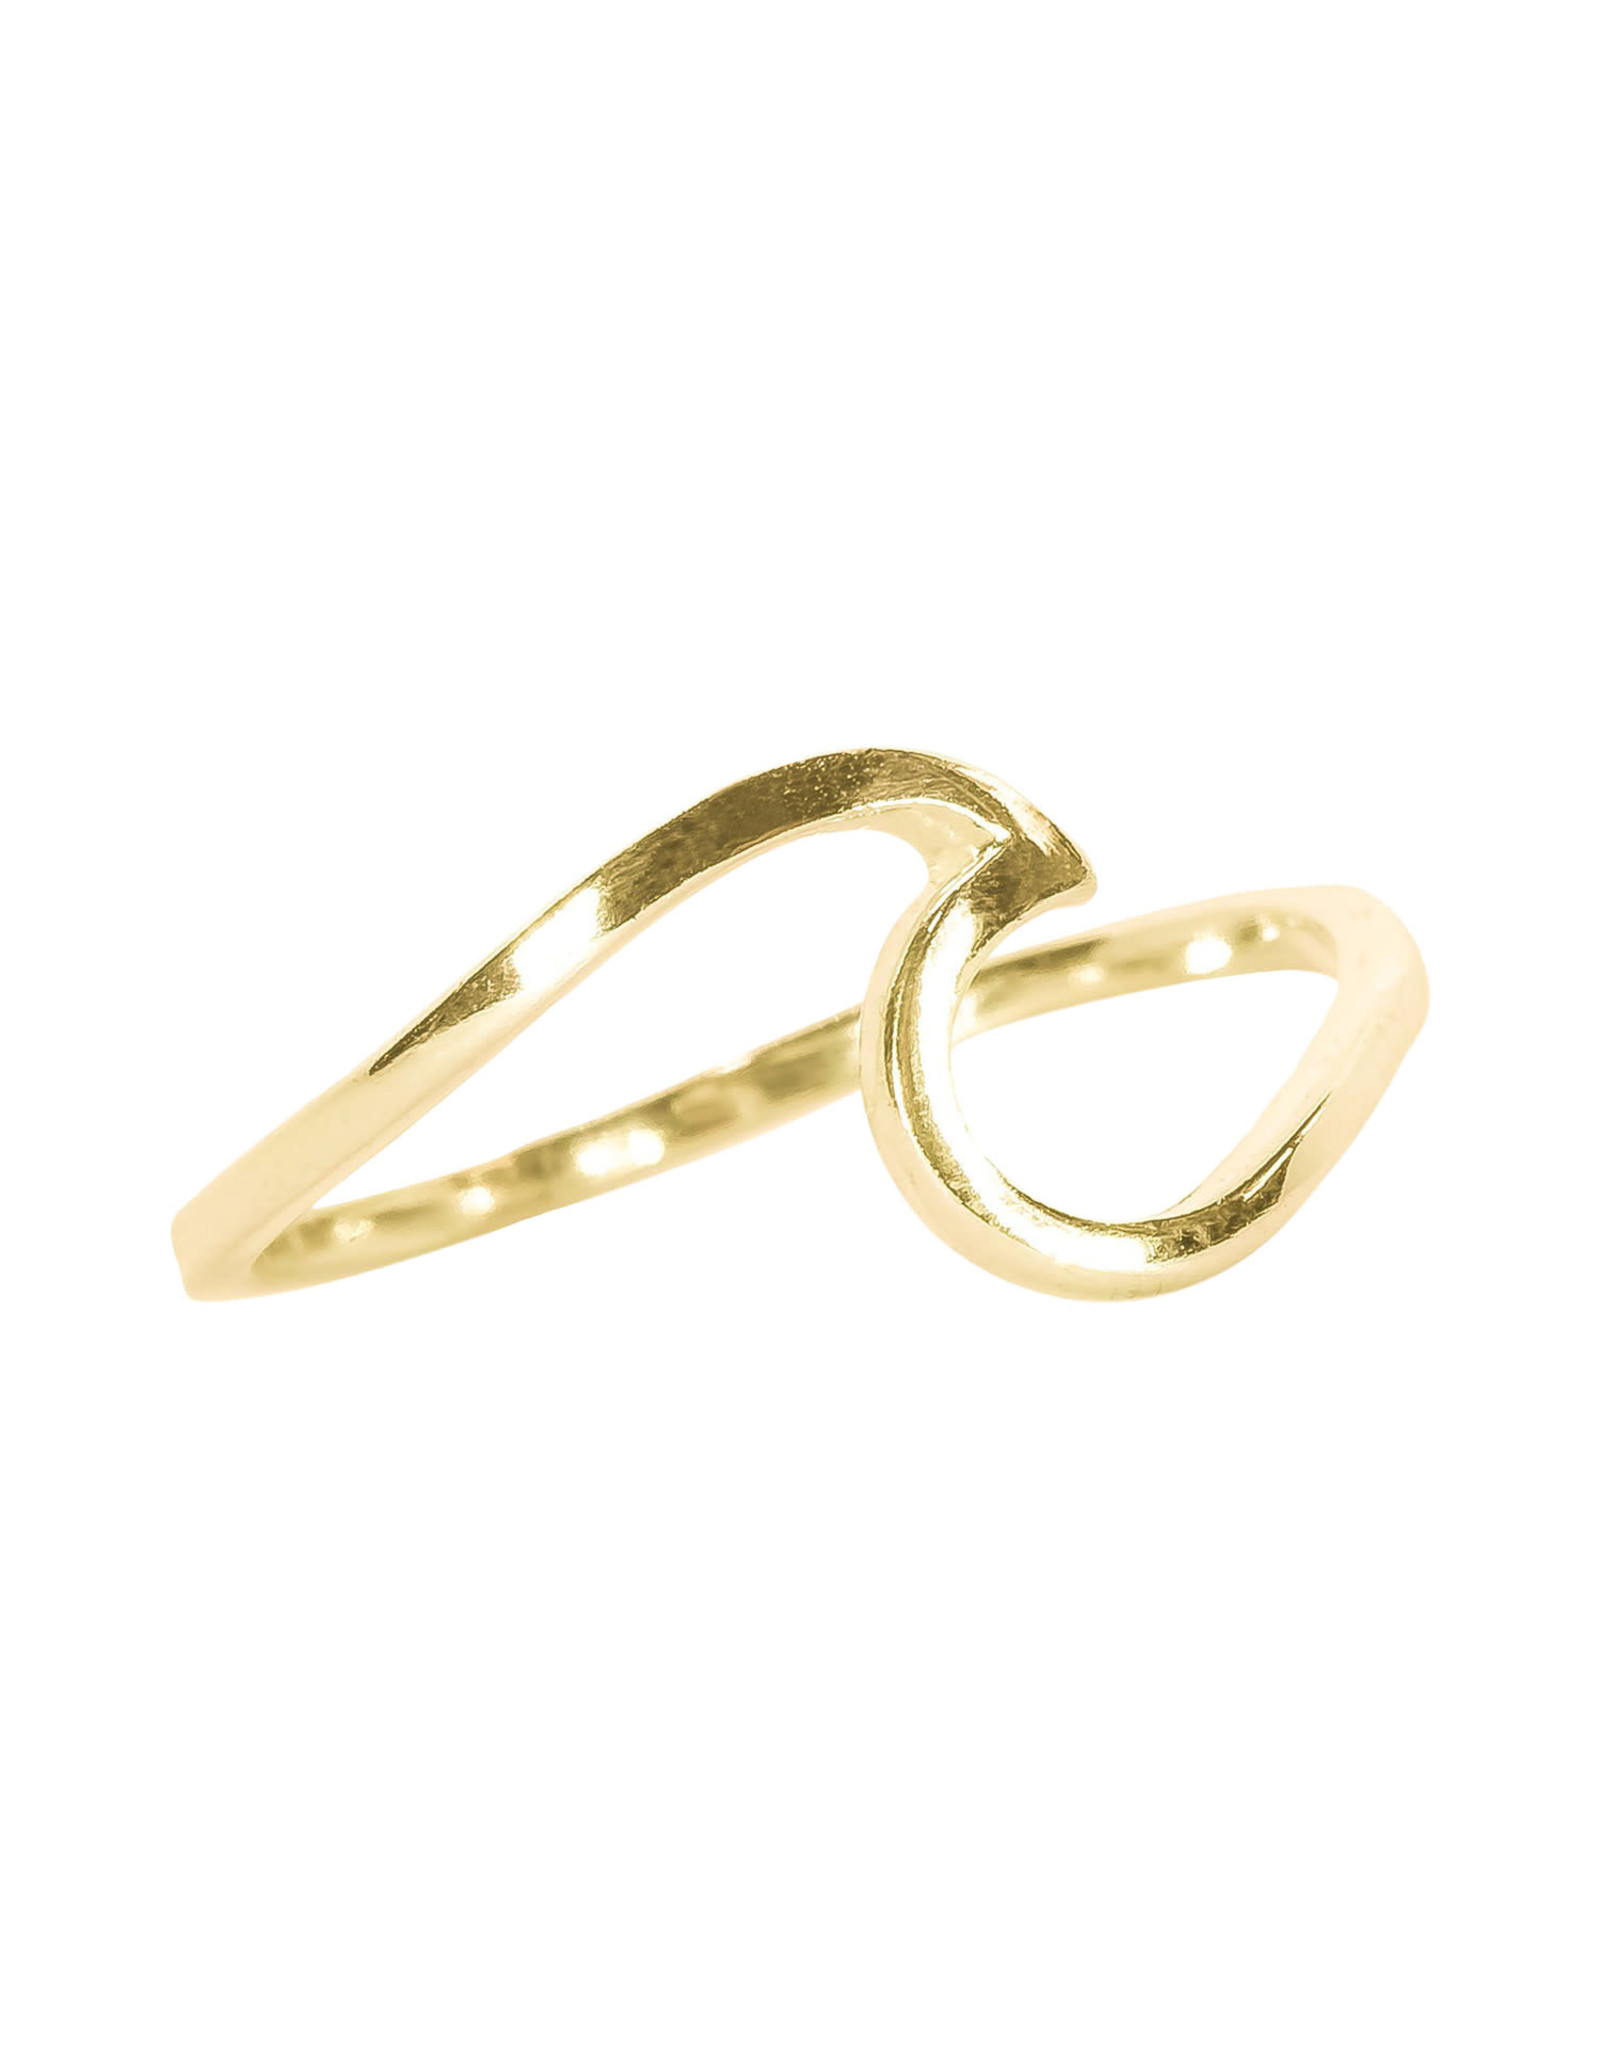 PURA VIDA WAVE RING GOLD